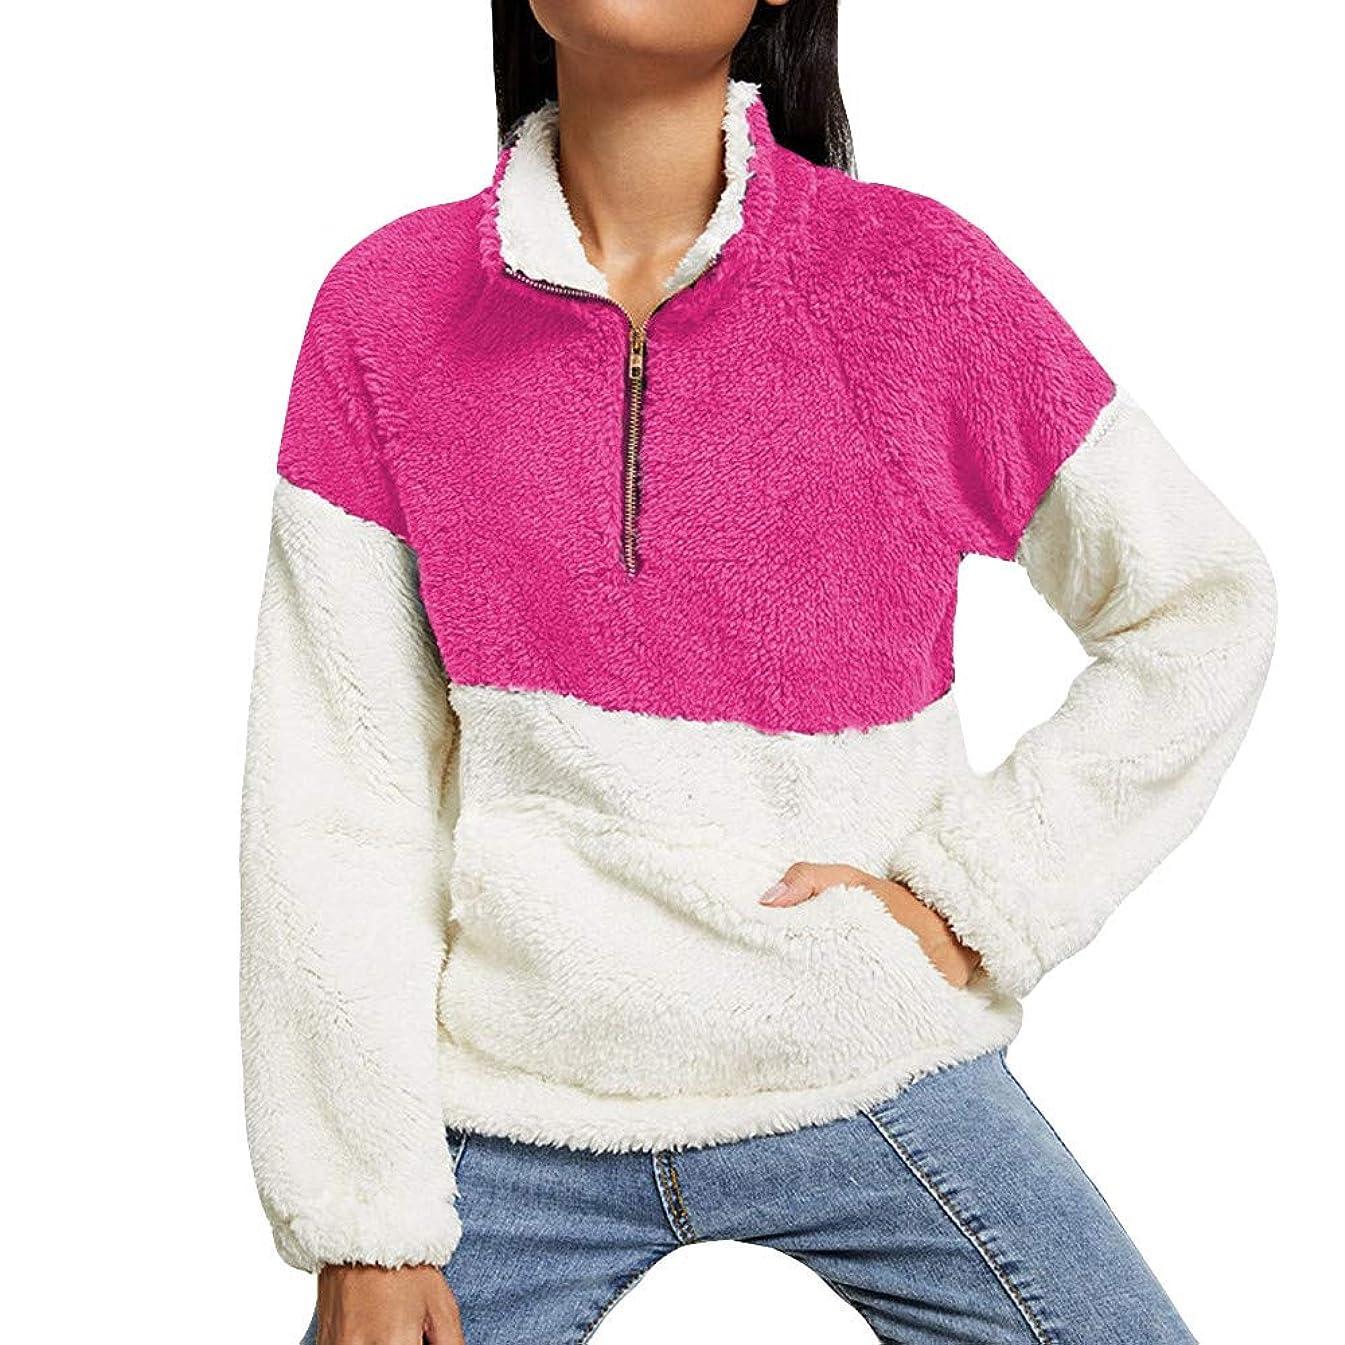 Franterd Women Sweatshirt Winter Warm Fluffy Fleece Coat Plush Zipper Turtleneck Blouse Fluffy Kangaroo Pocket Pullover